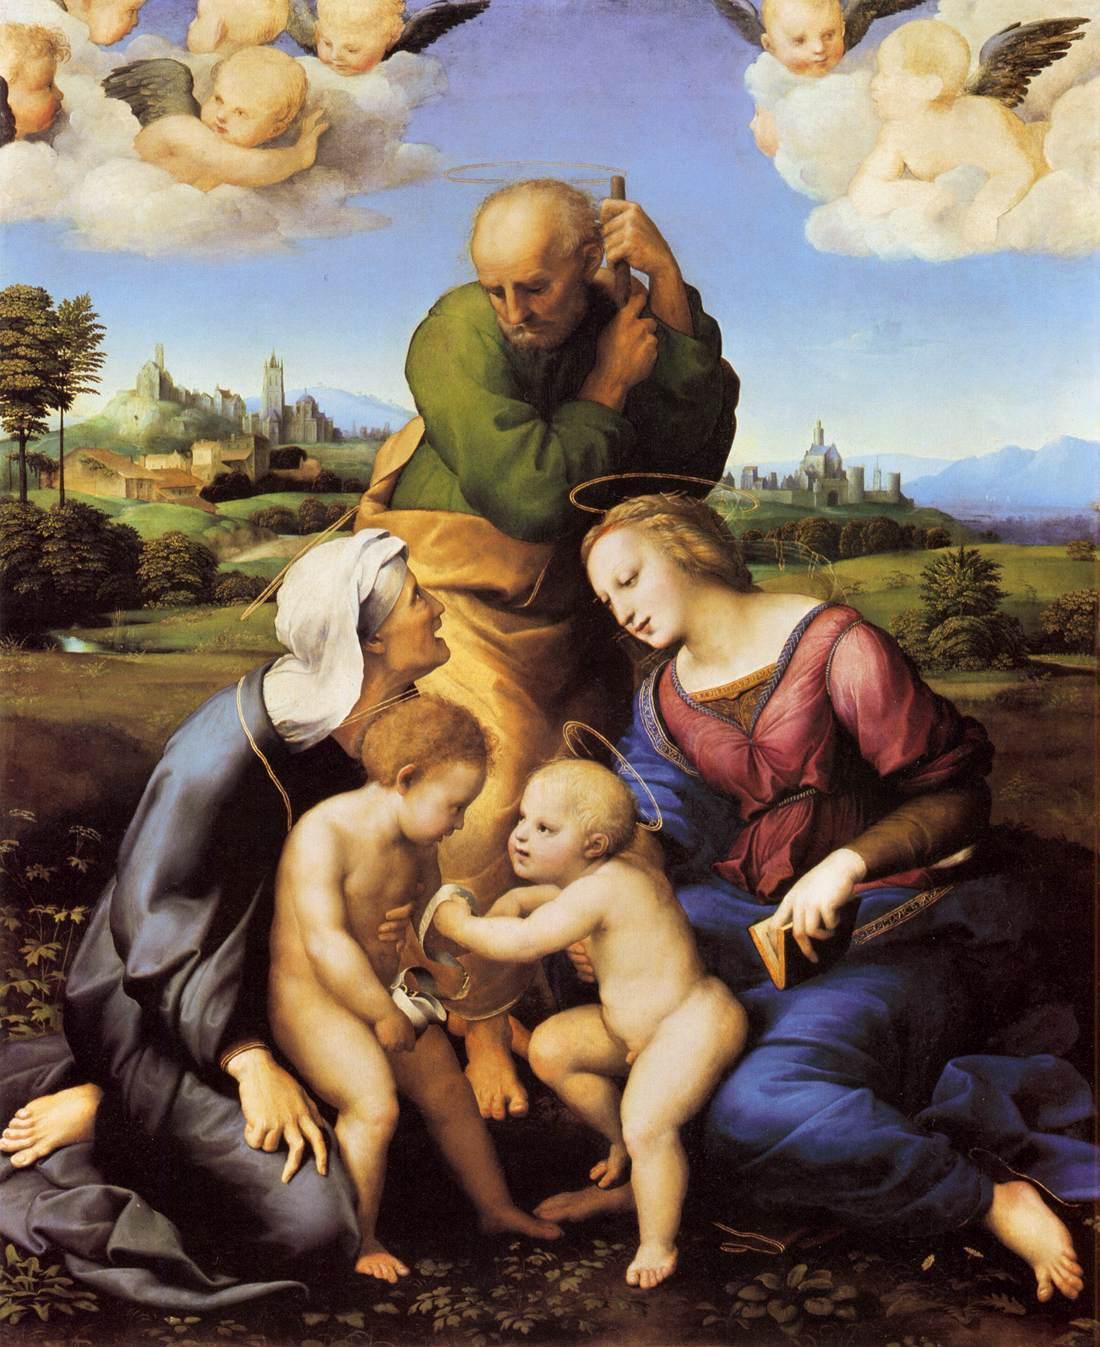 Raffael. Madonna aus dem Hause Canigiani. um 1505/06. Öl / Holz. 131 x 107cm